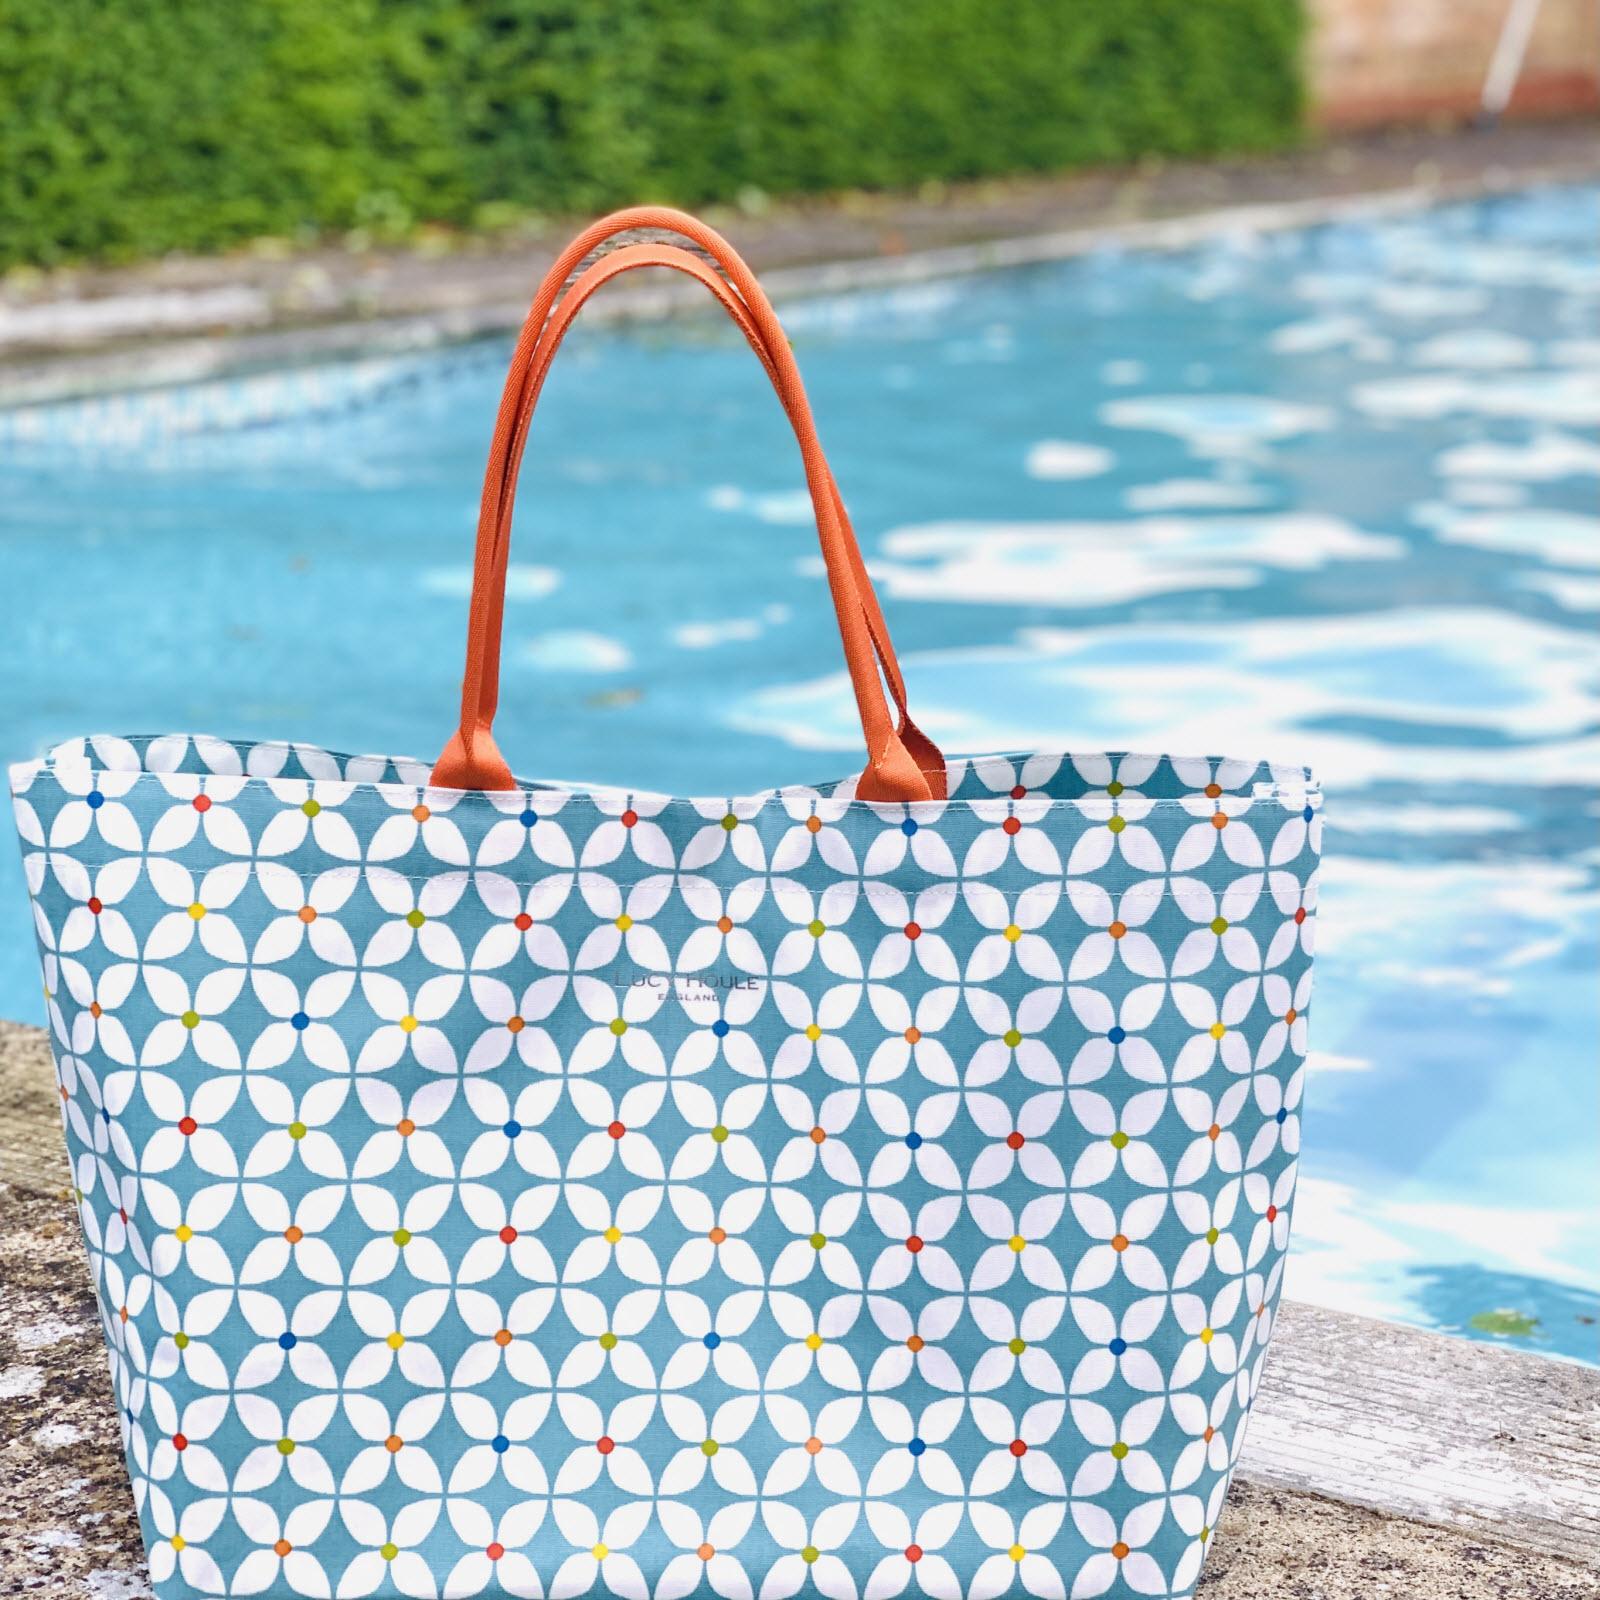 Modern Daisy Aqua Extra Large Tote Bag with Orange Handles